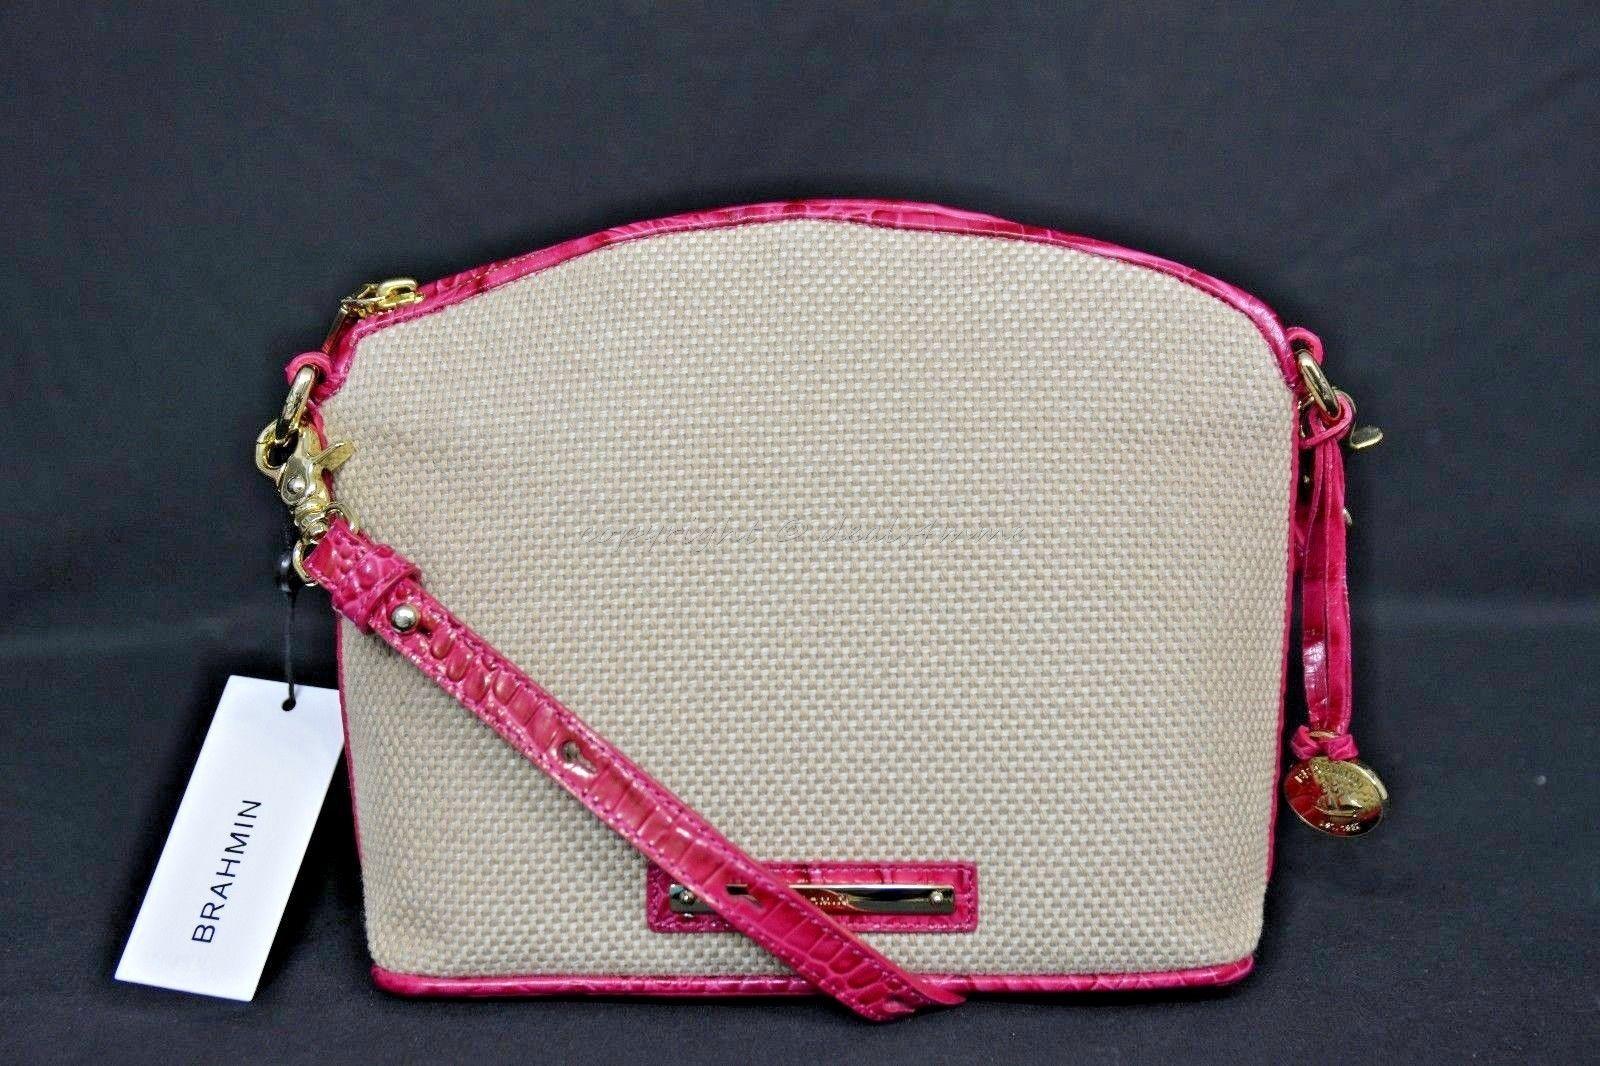 NWT Brahmin Mini Duxbury Shoulder Bag in Punch Harbor, Pink Leather/Beige Fabric